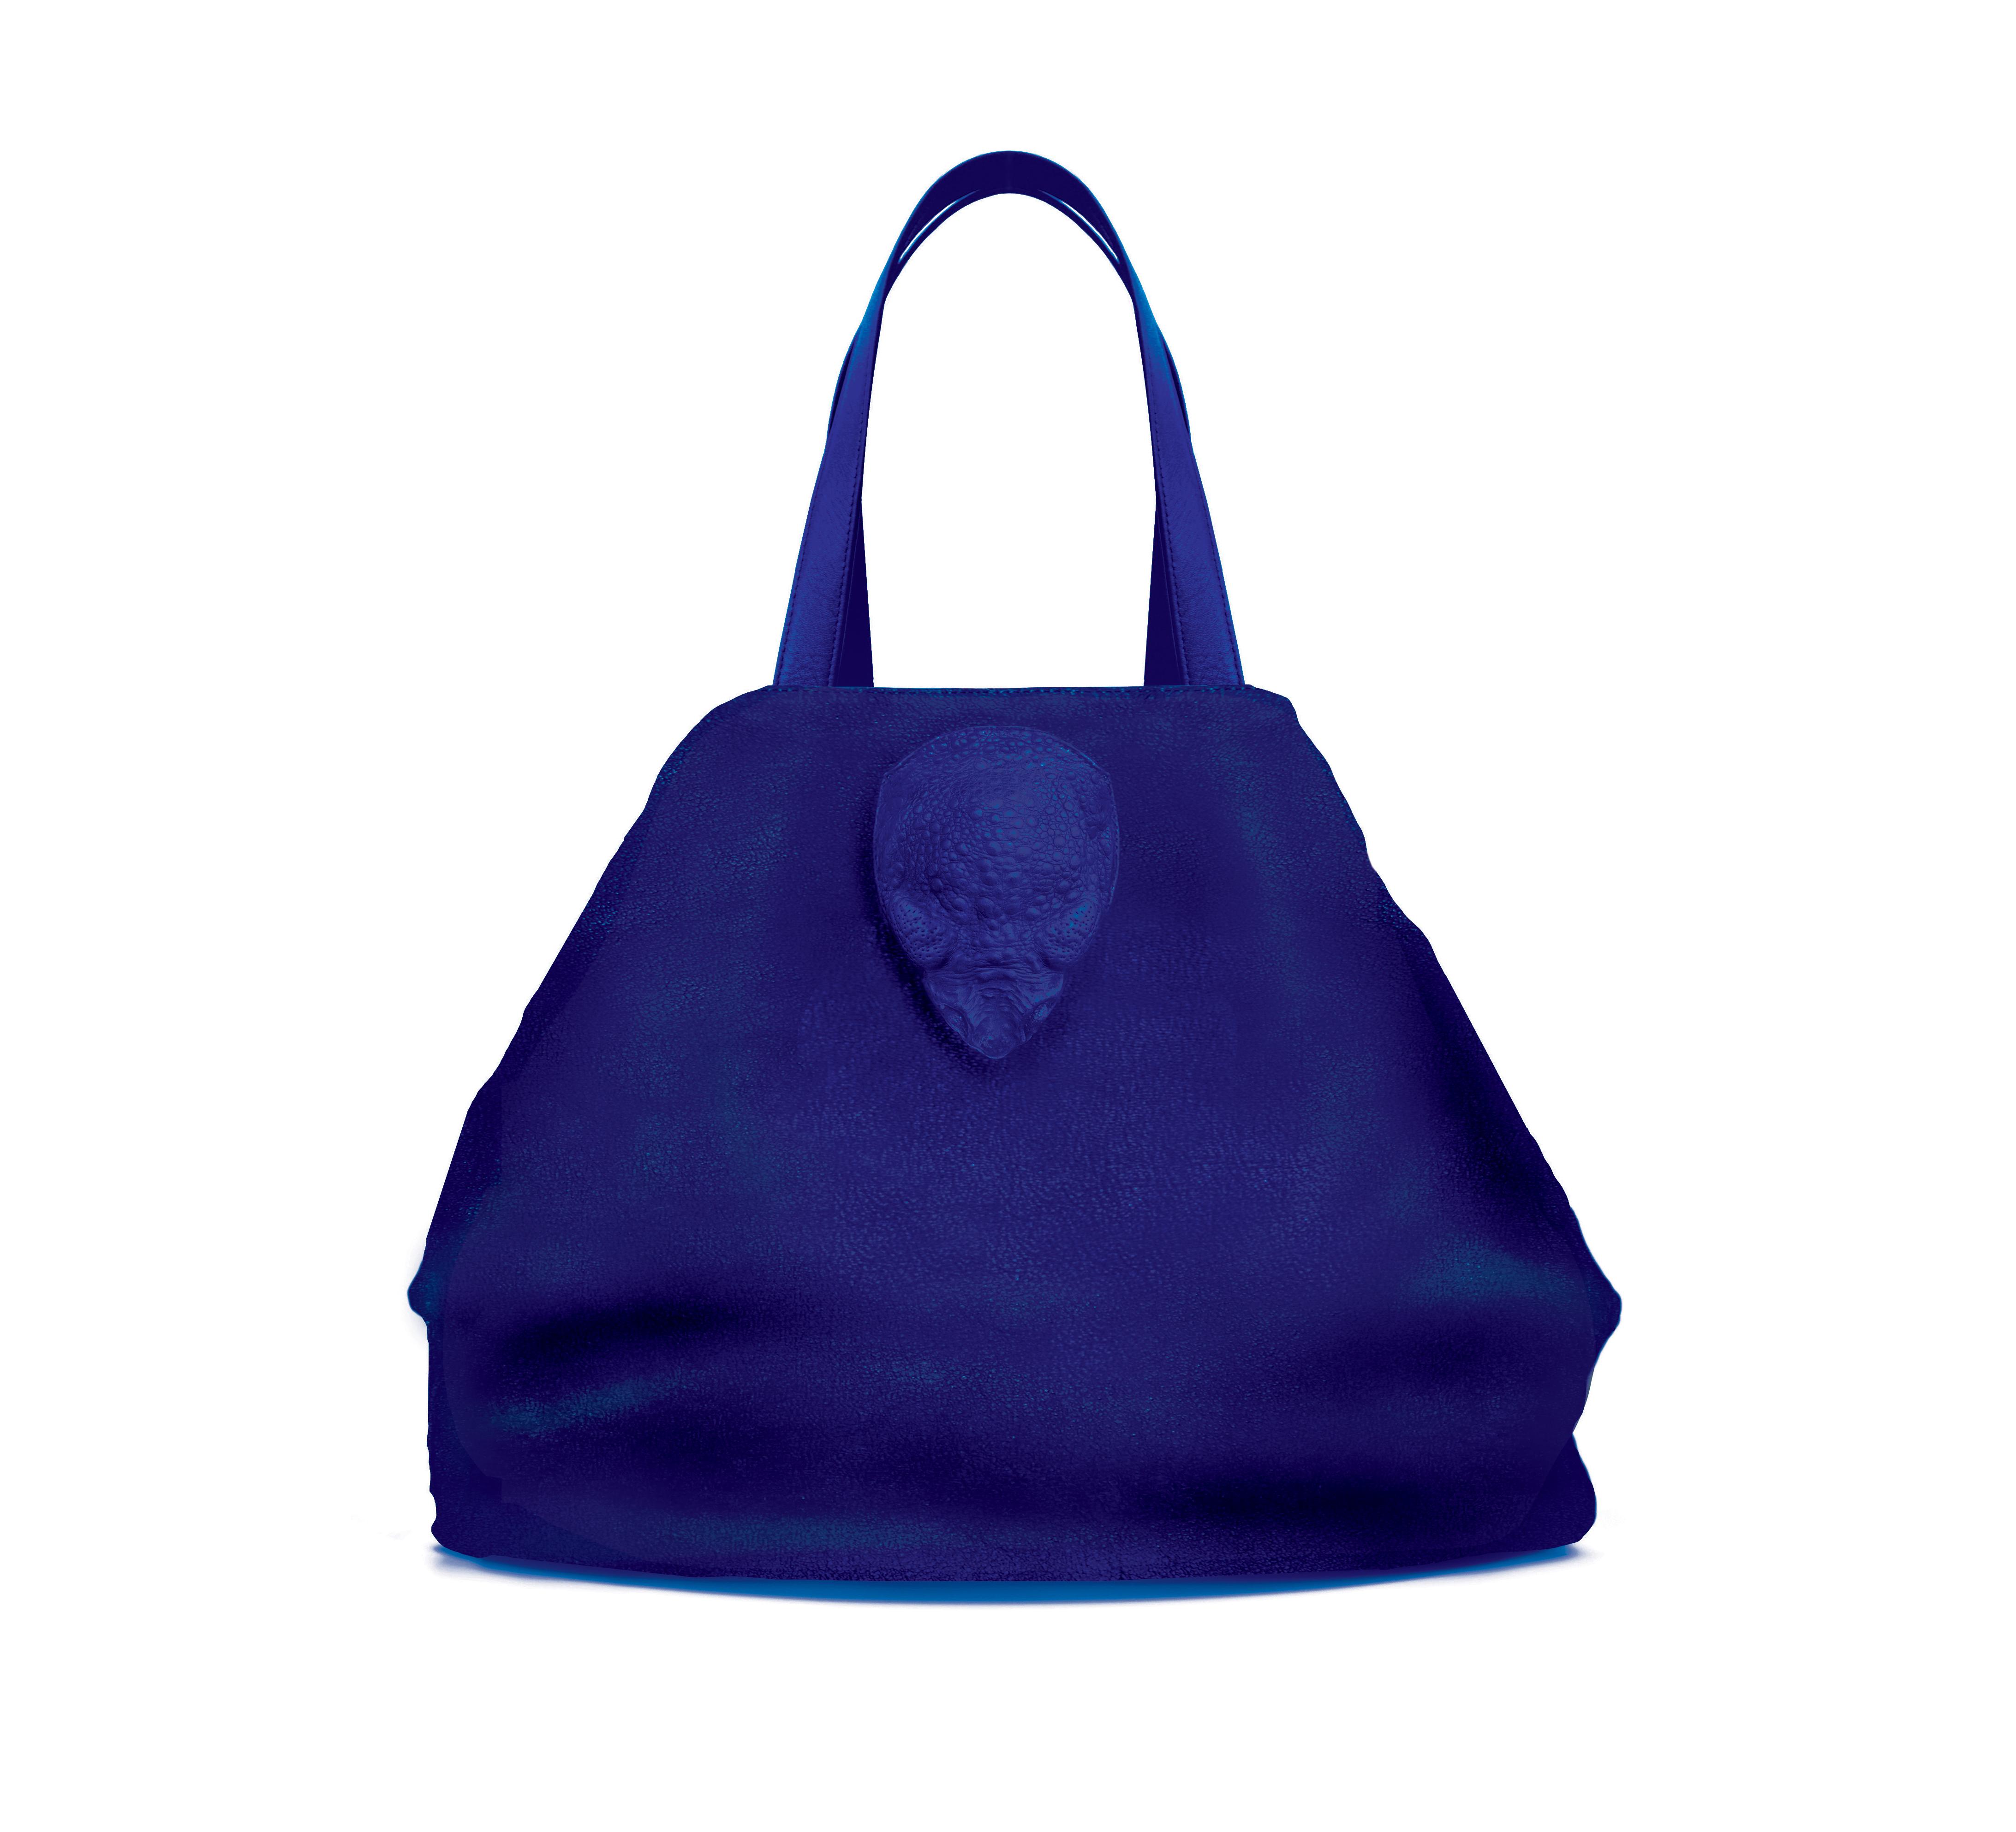 kobja, toad, shop, frog, handmade, handcrafted, wallet, bag, gift, cadeau